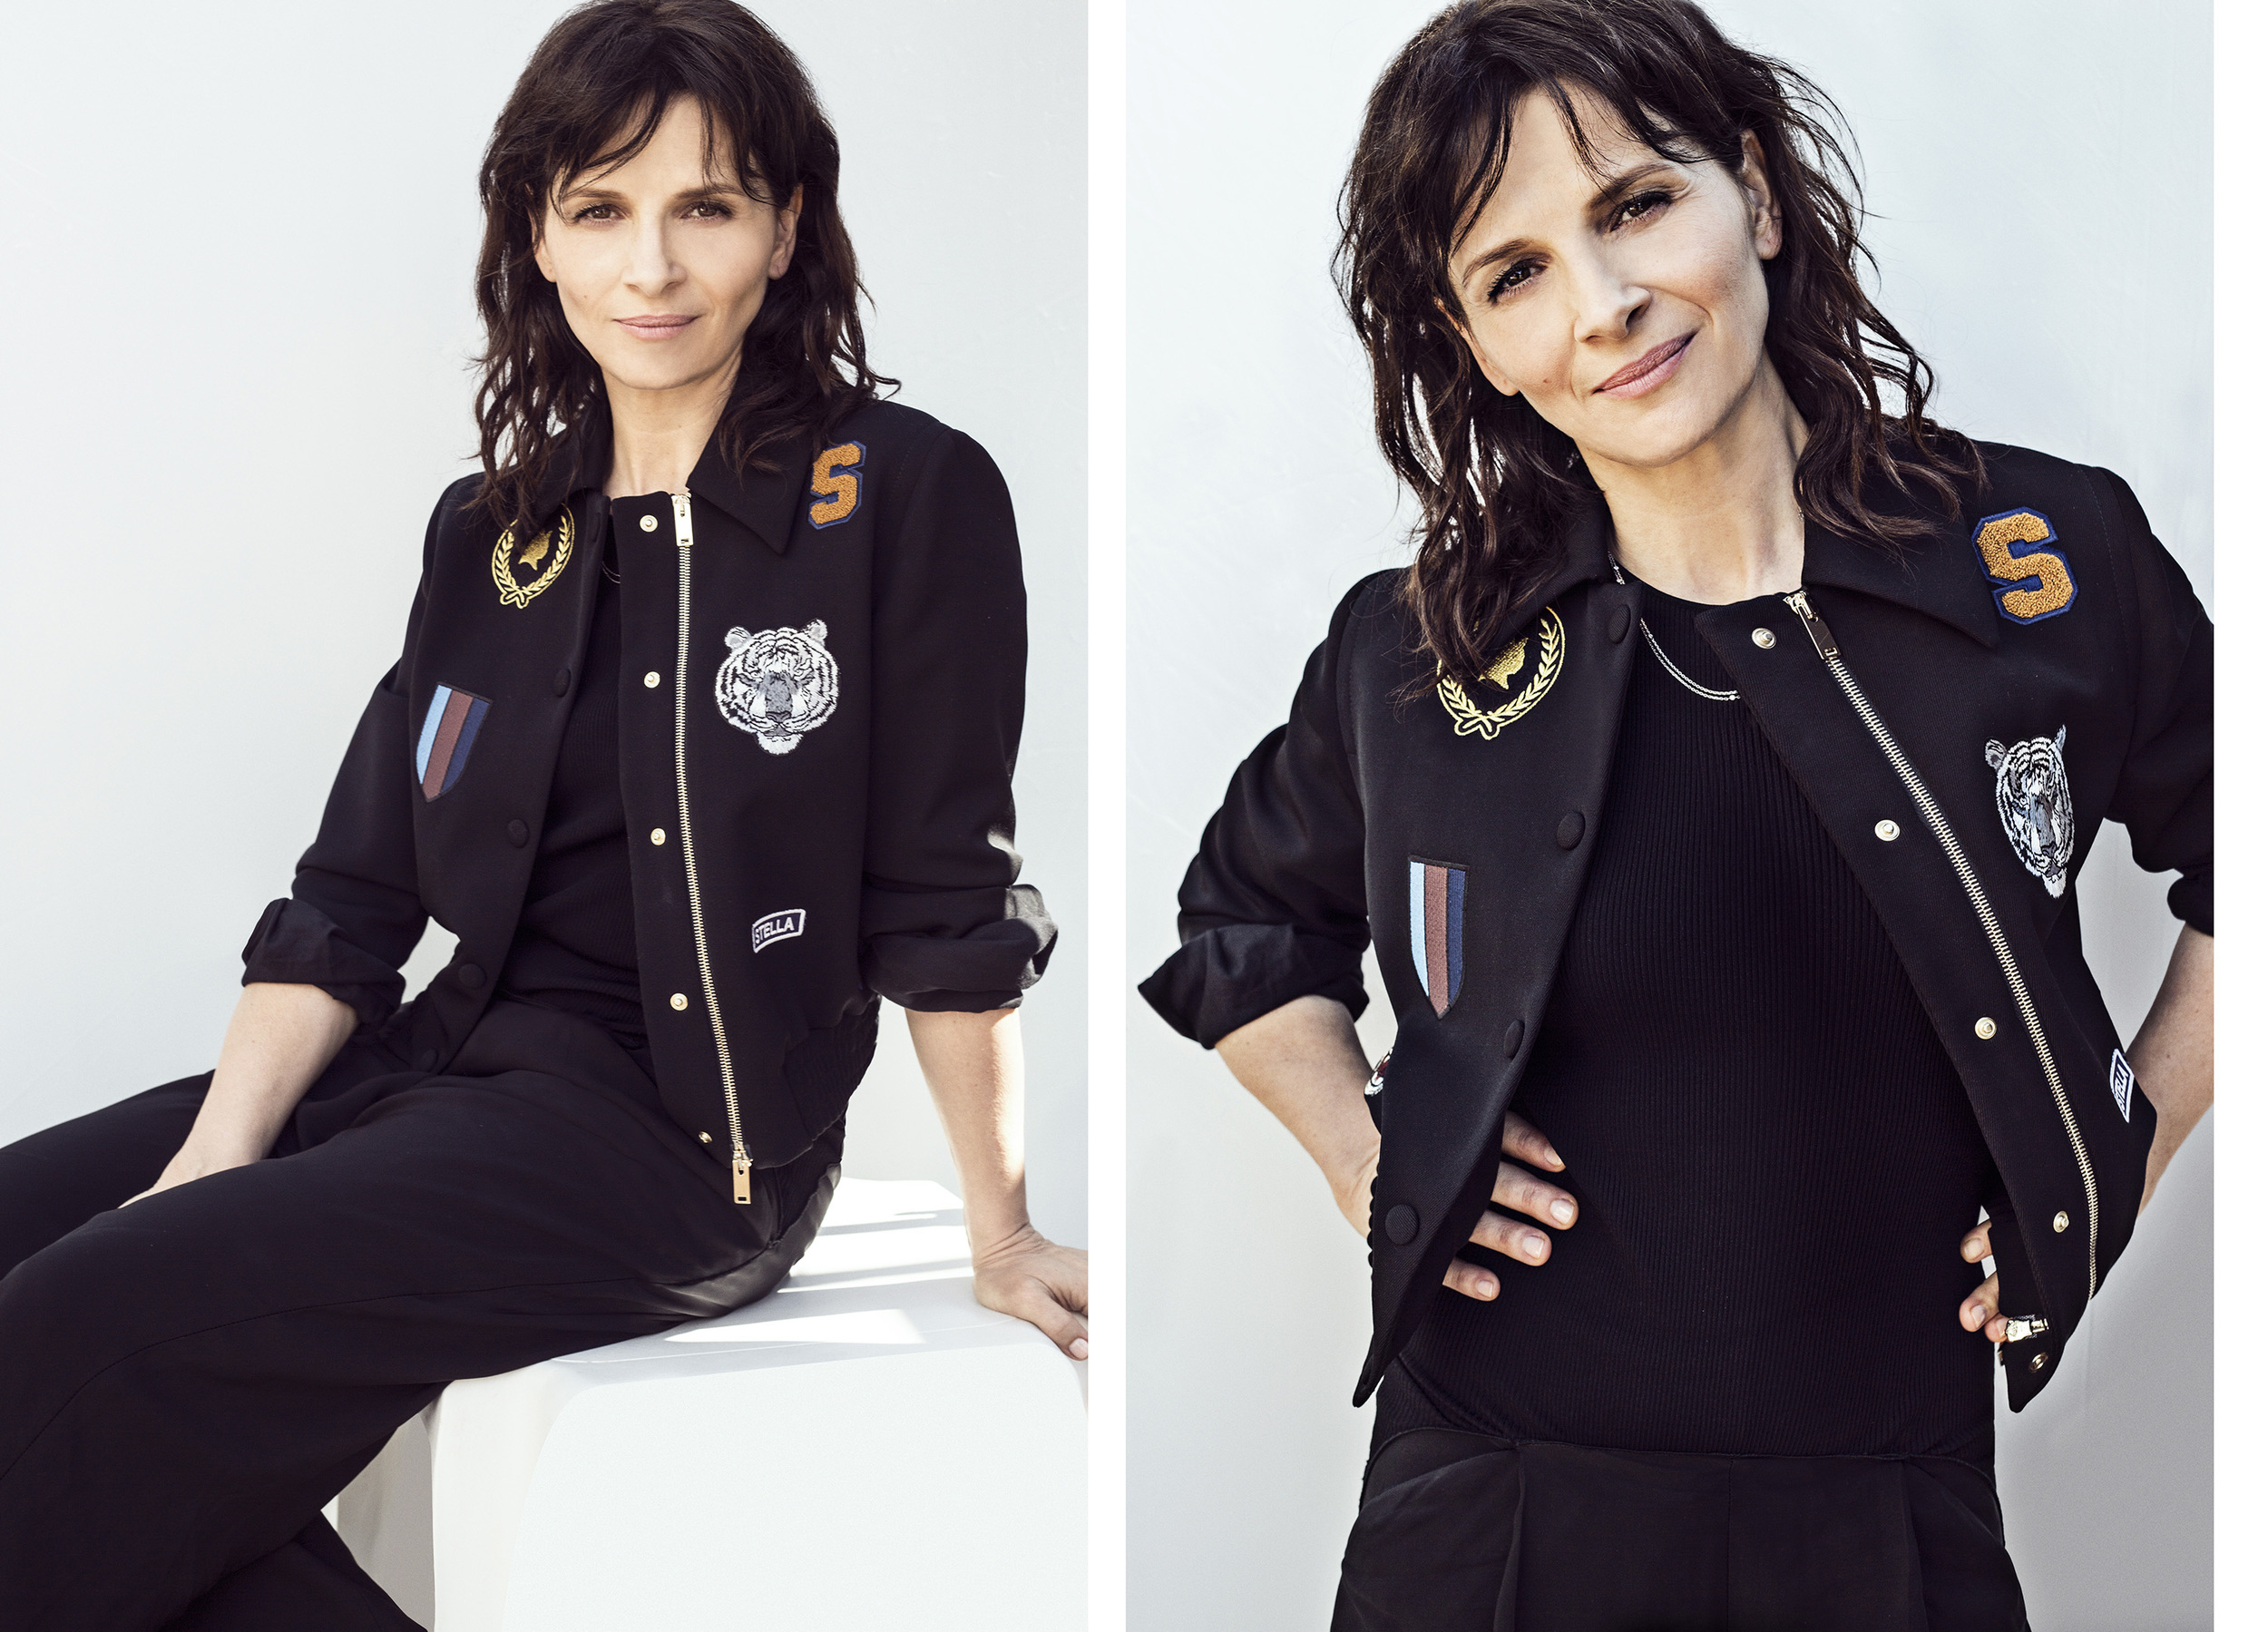 Juliette Binoche / W Magazine